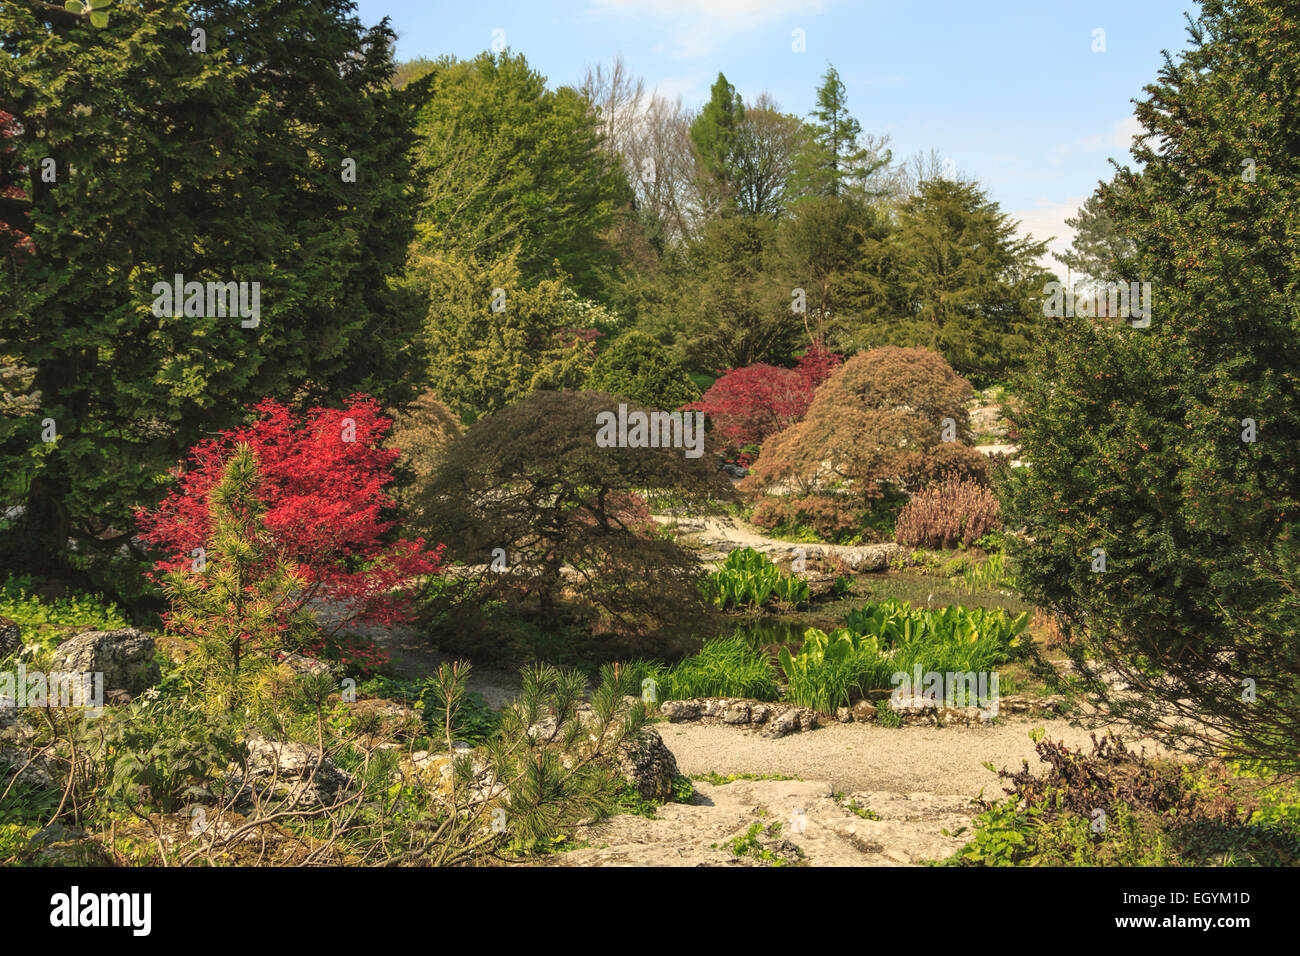 Sizergh Castle And Garden Stock Photos & Sizergh Castle And Garden ...